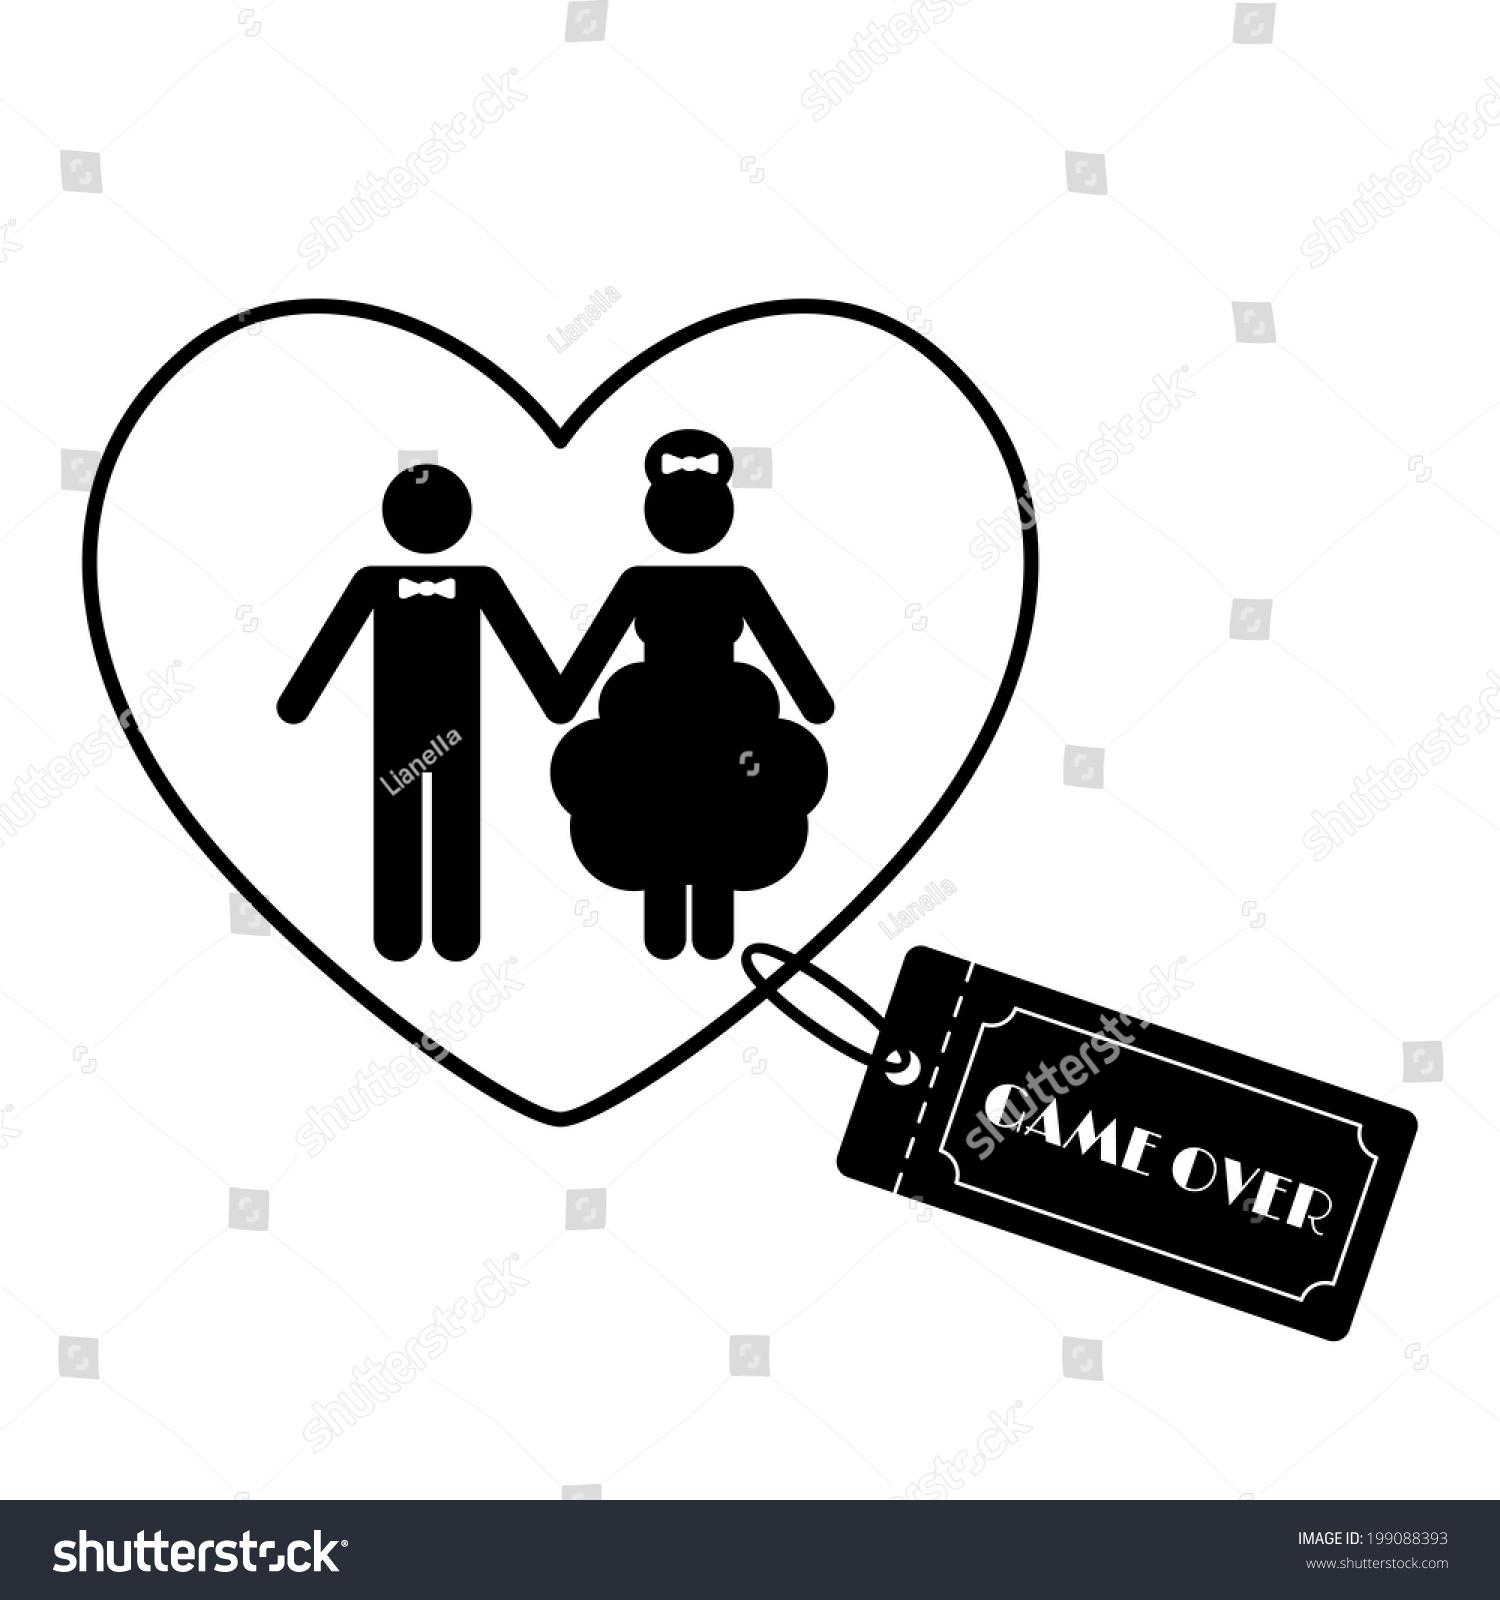 Cartoon Funny Wedding Symbols Game Over Stock Vector Royalty Free 199088393